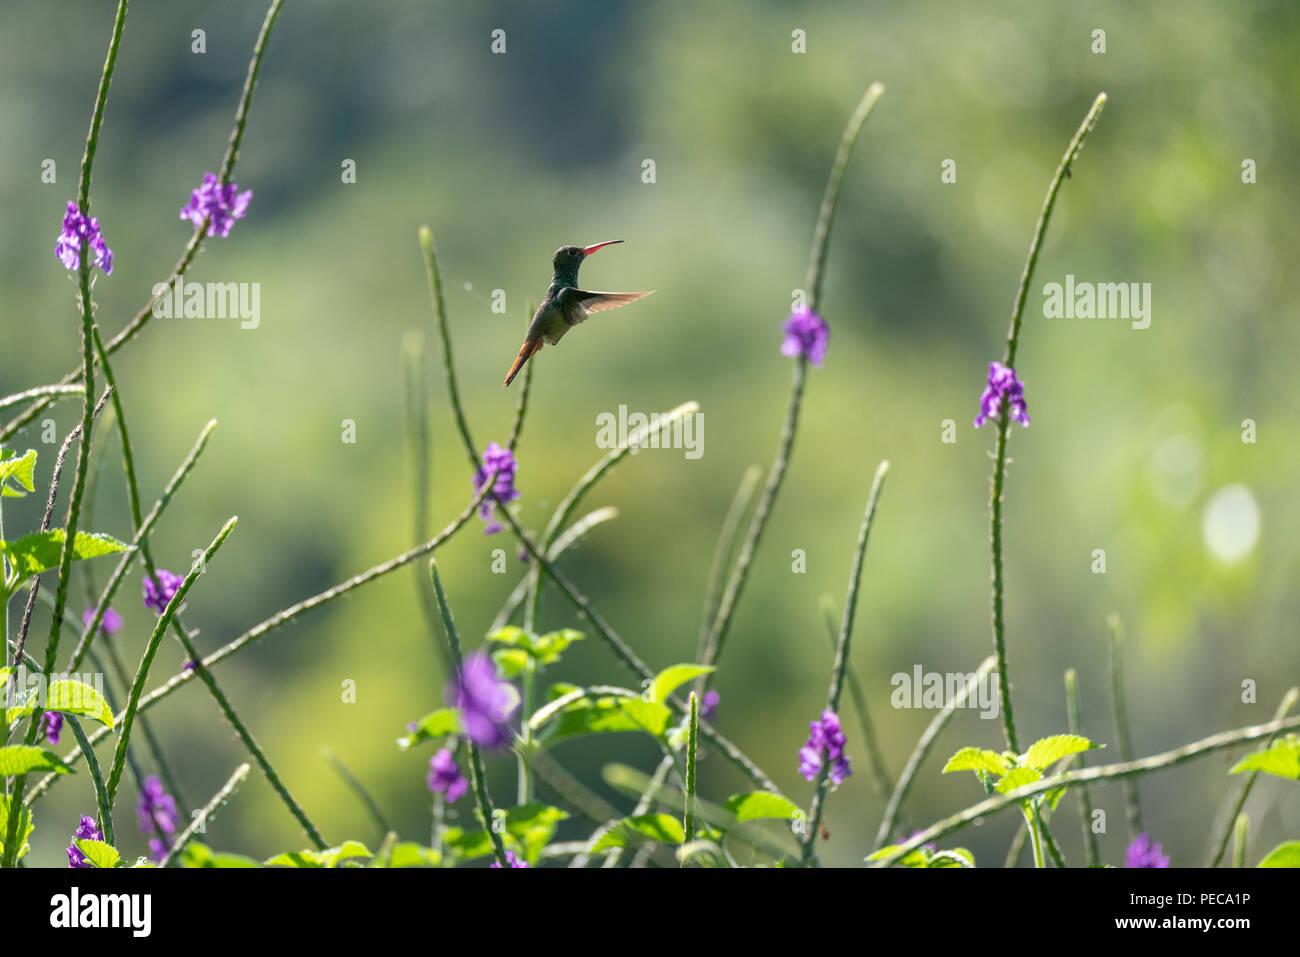 Hummingbird im Flug unter blauen Blüten, Nebelwald Mindo, Ecuador Stockbild